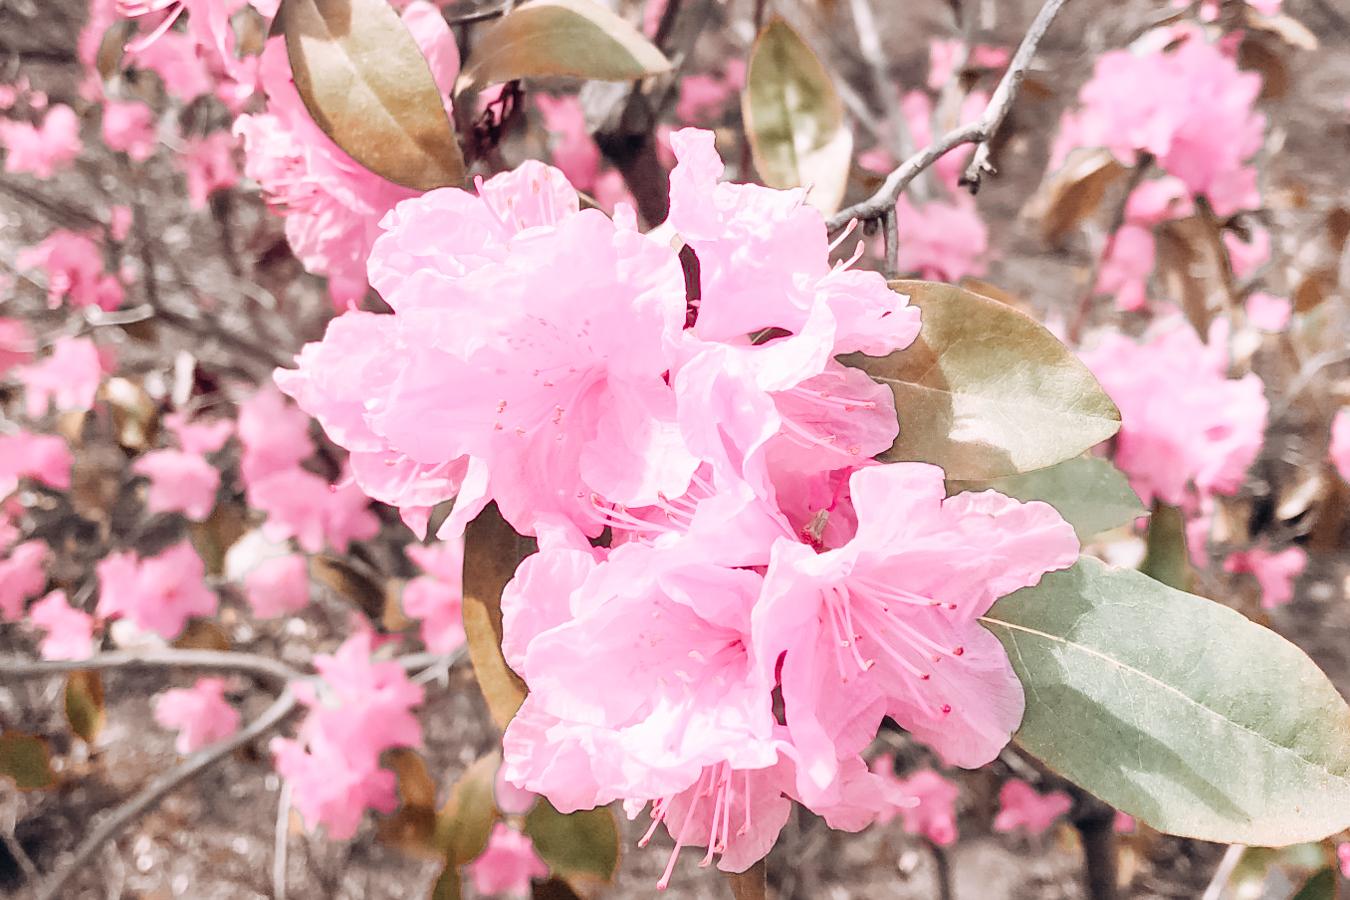 Pink flower at the Lewis Ginter Botanical Garden